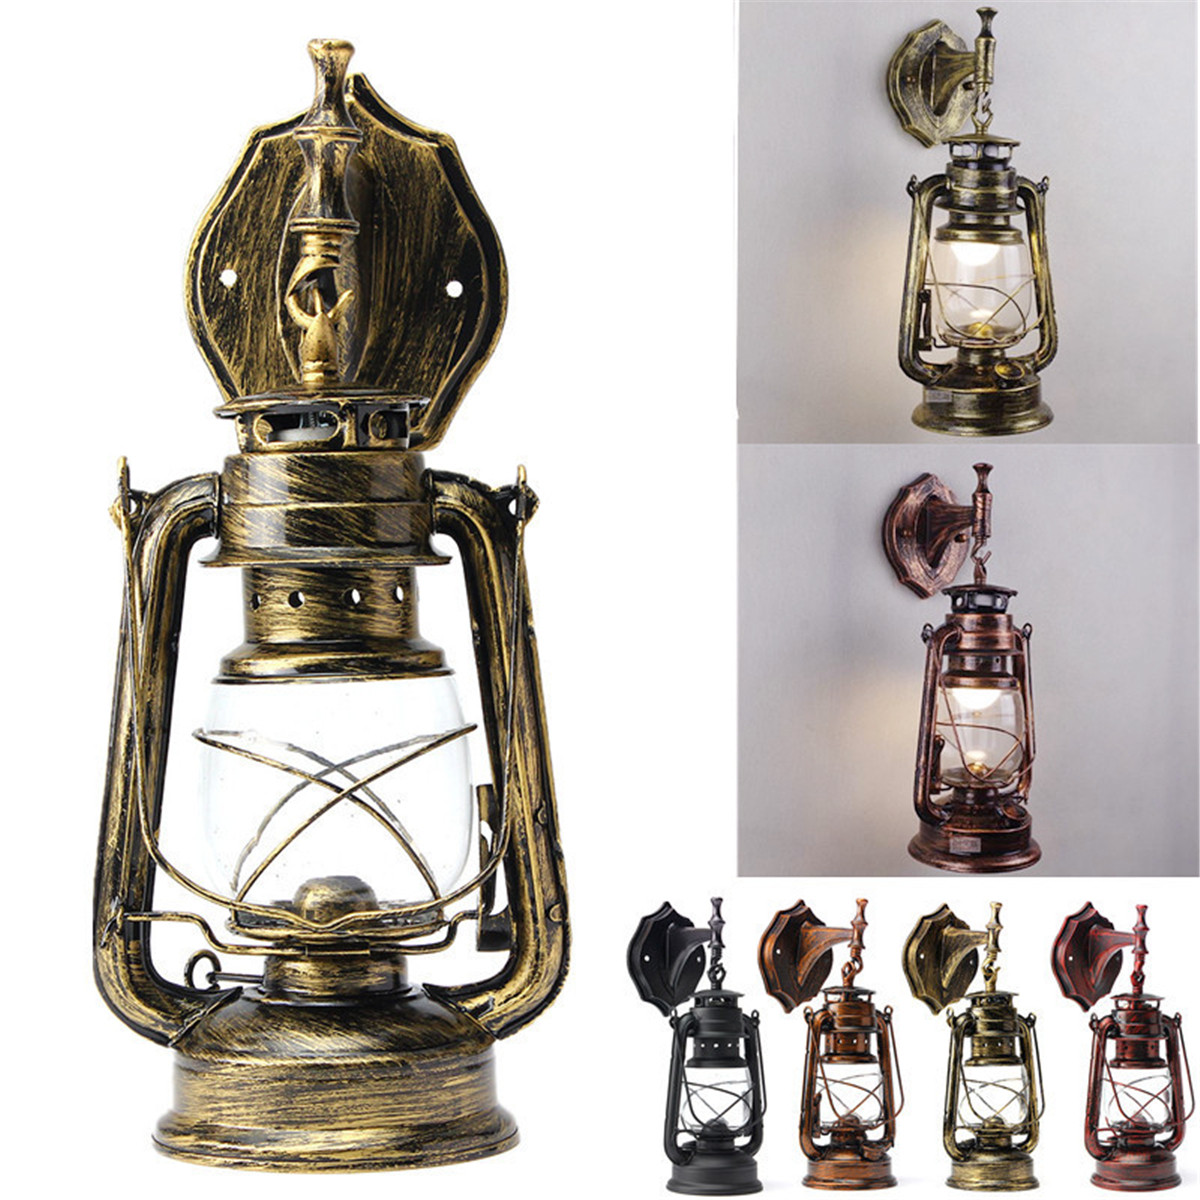 E27 Retro Classic Kerosene Lamp Wall Light Sconce Holder Portable Lights Adornment Bar Club Coffee Shop Restaurant Home Decor